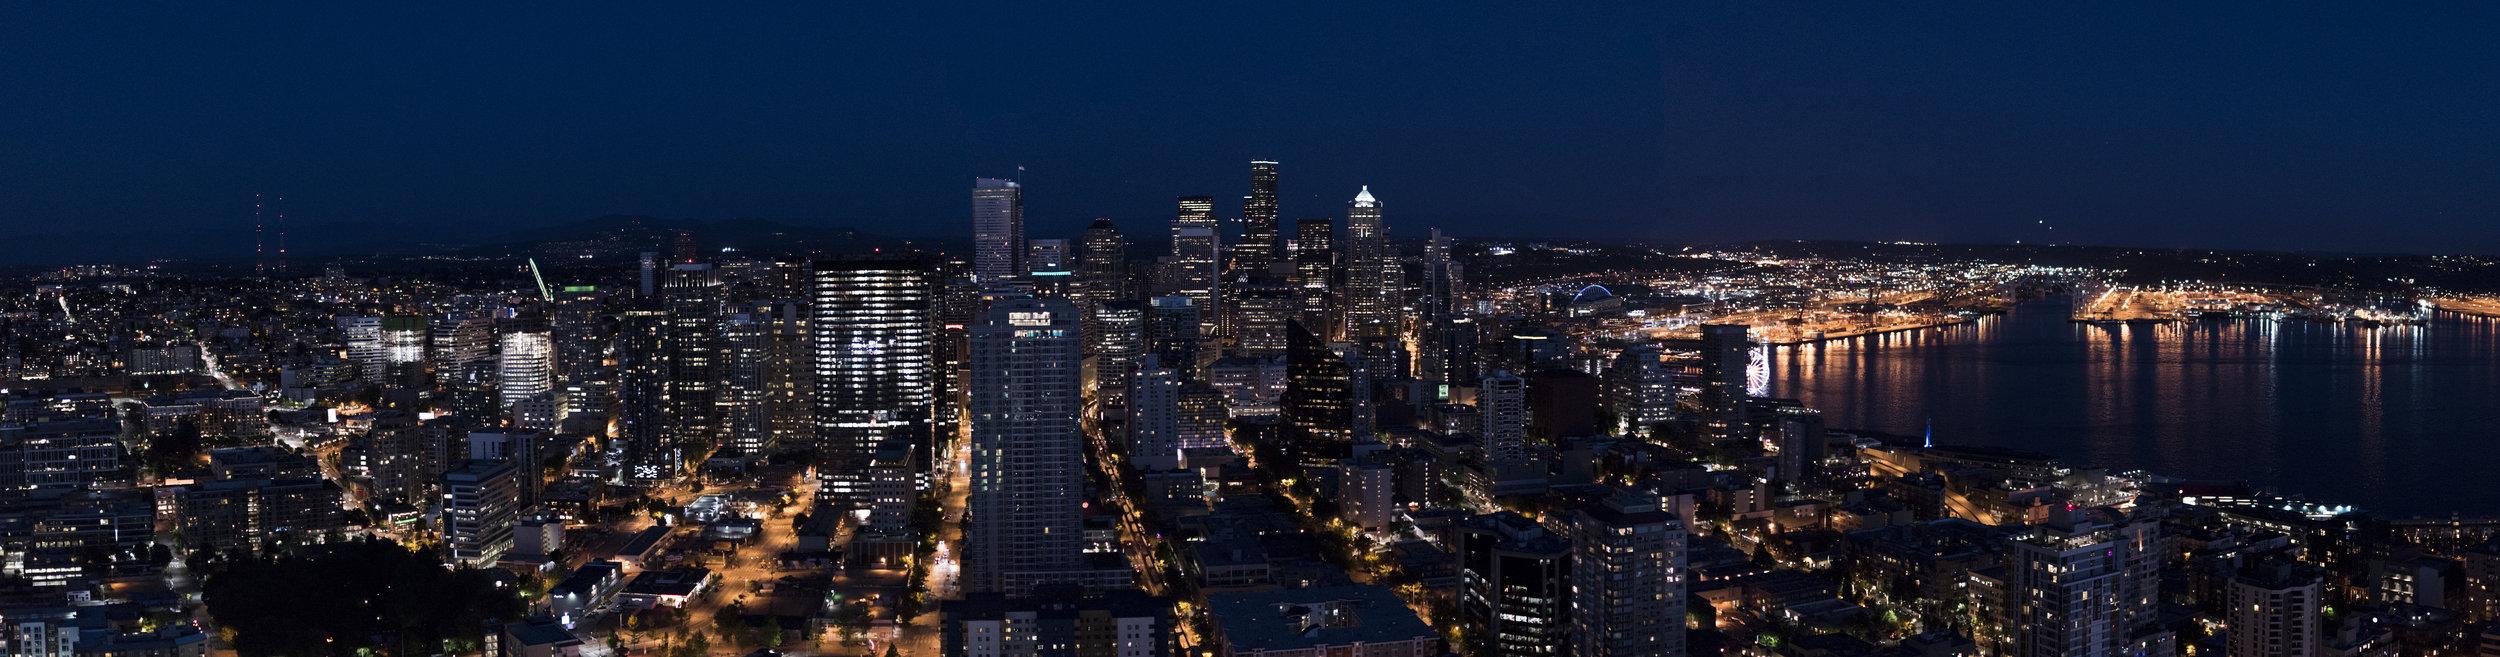 Seattle Skyline-1.jpg